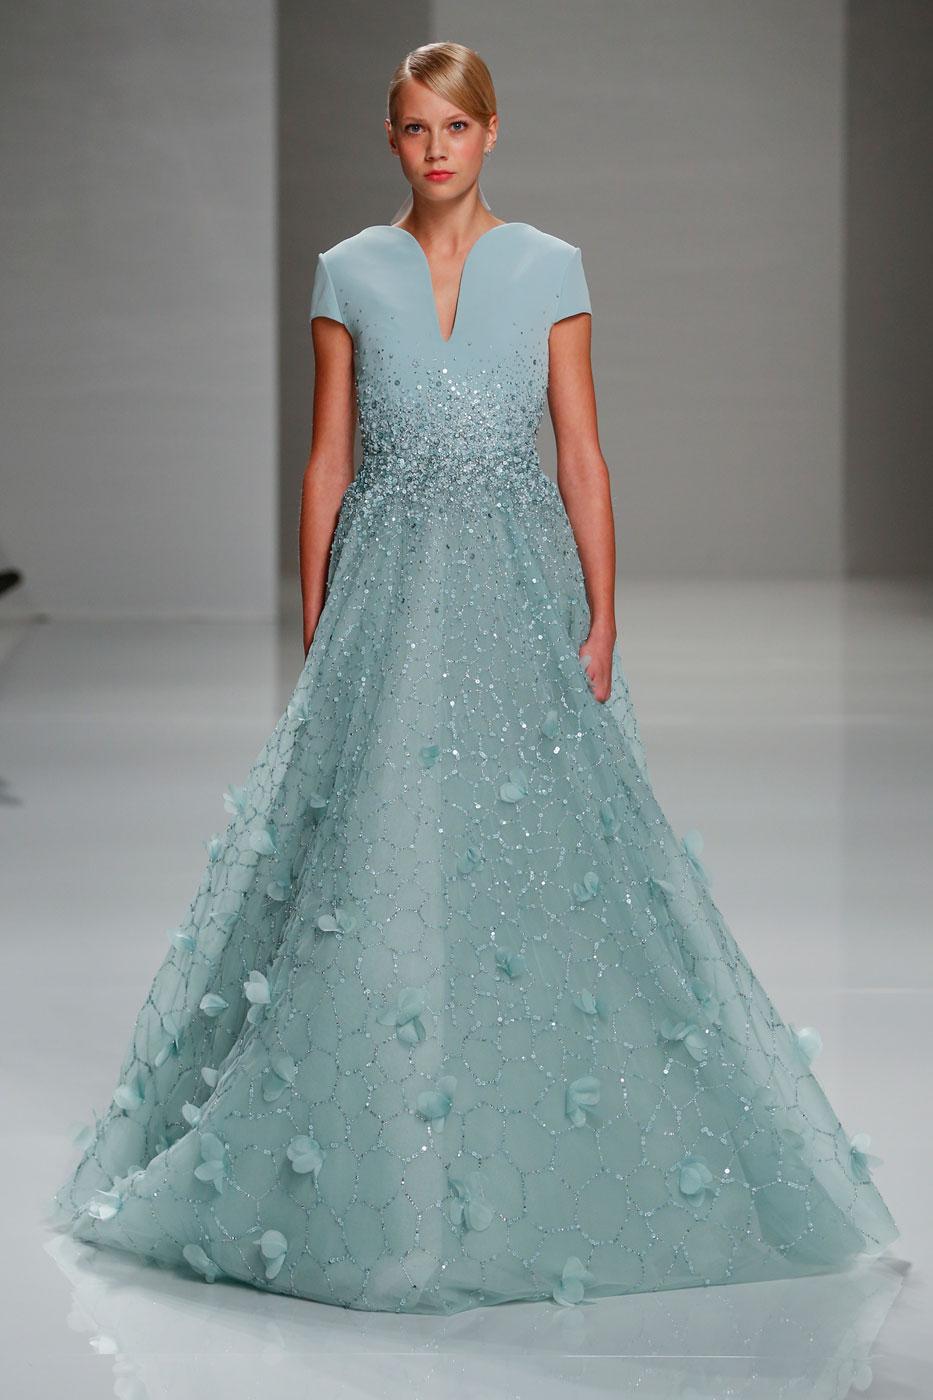 Georges-Hobeika-fashion-runway-show-haute-couture-paris-spring-2015-the-impression-75